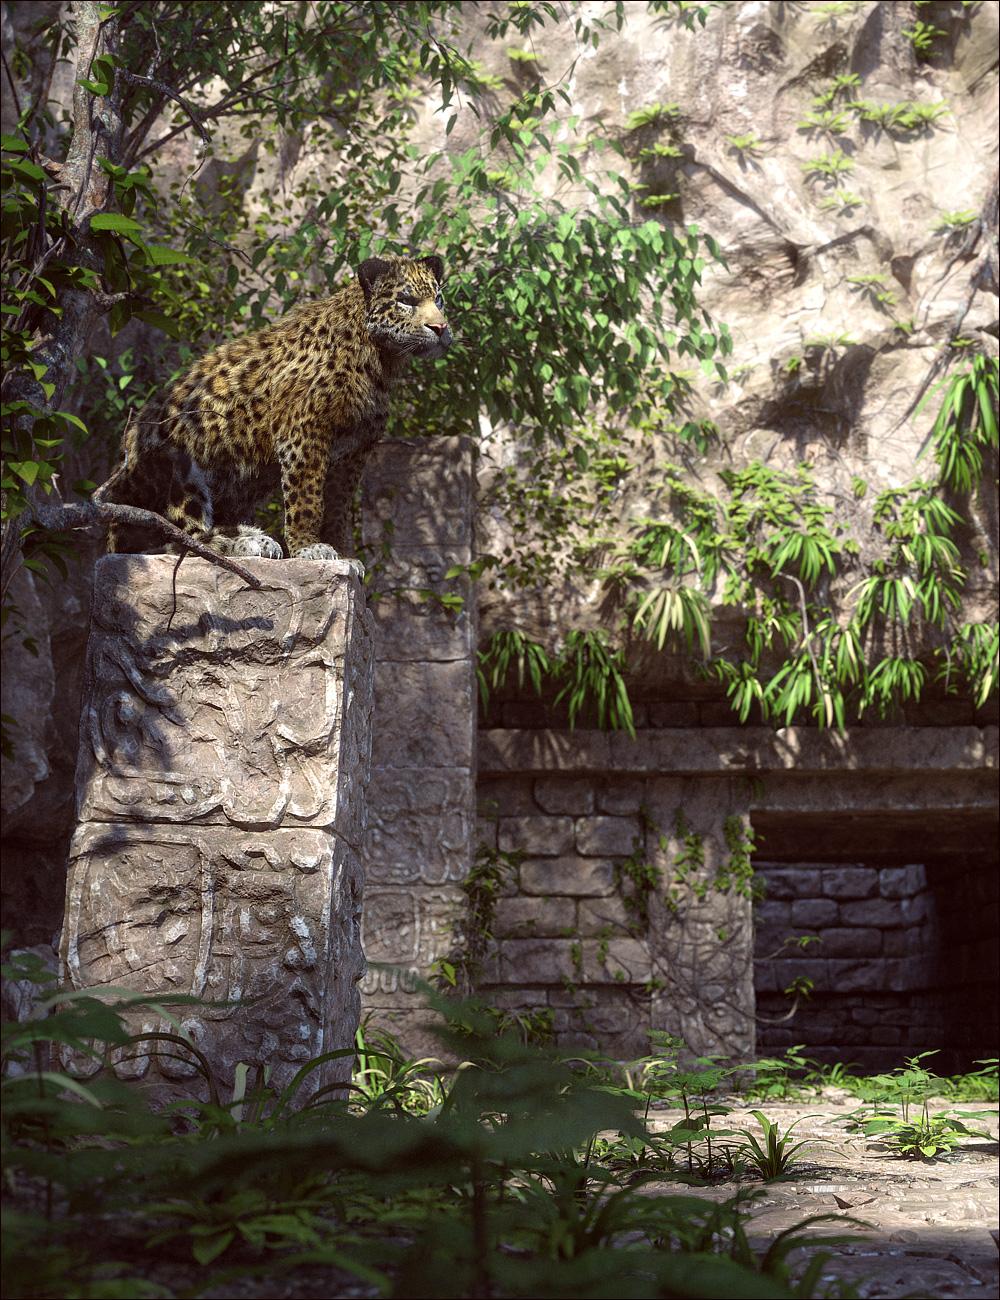 Mayan Ruins by: Stonemason, 3D Models by Daz 3D